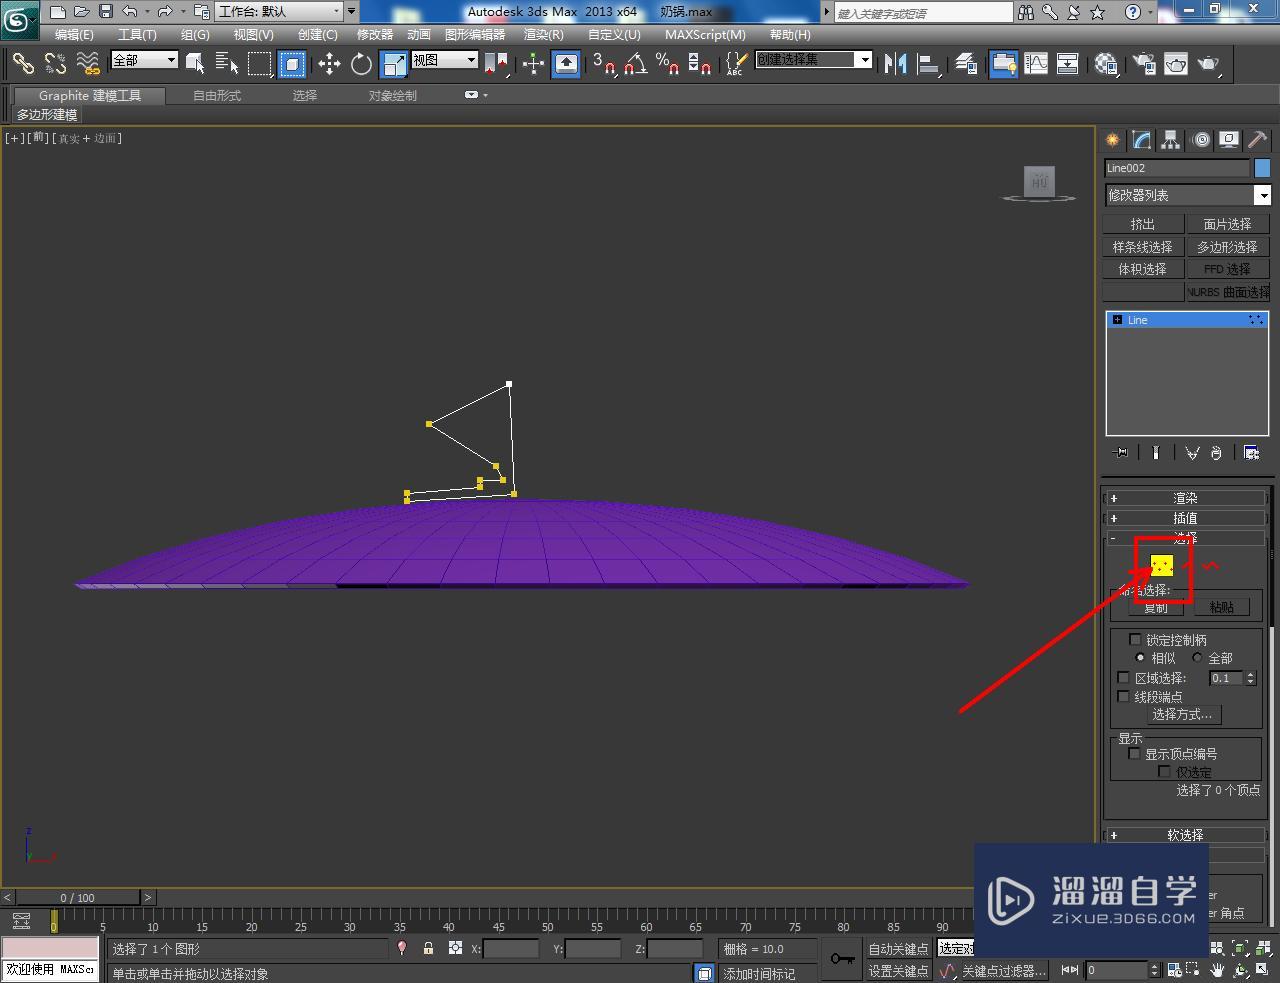 3DMax奶锅盖模型制作教程